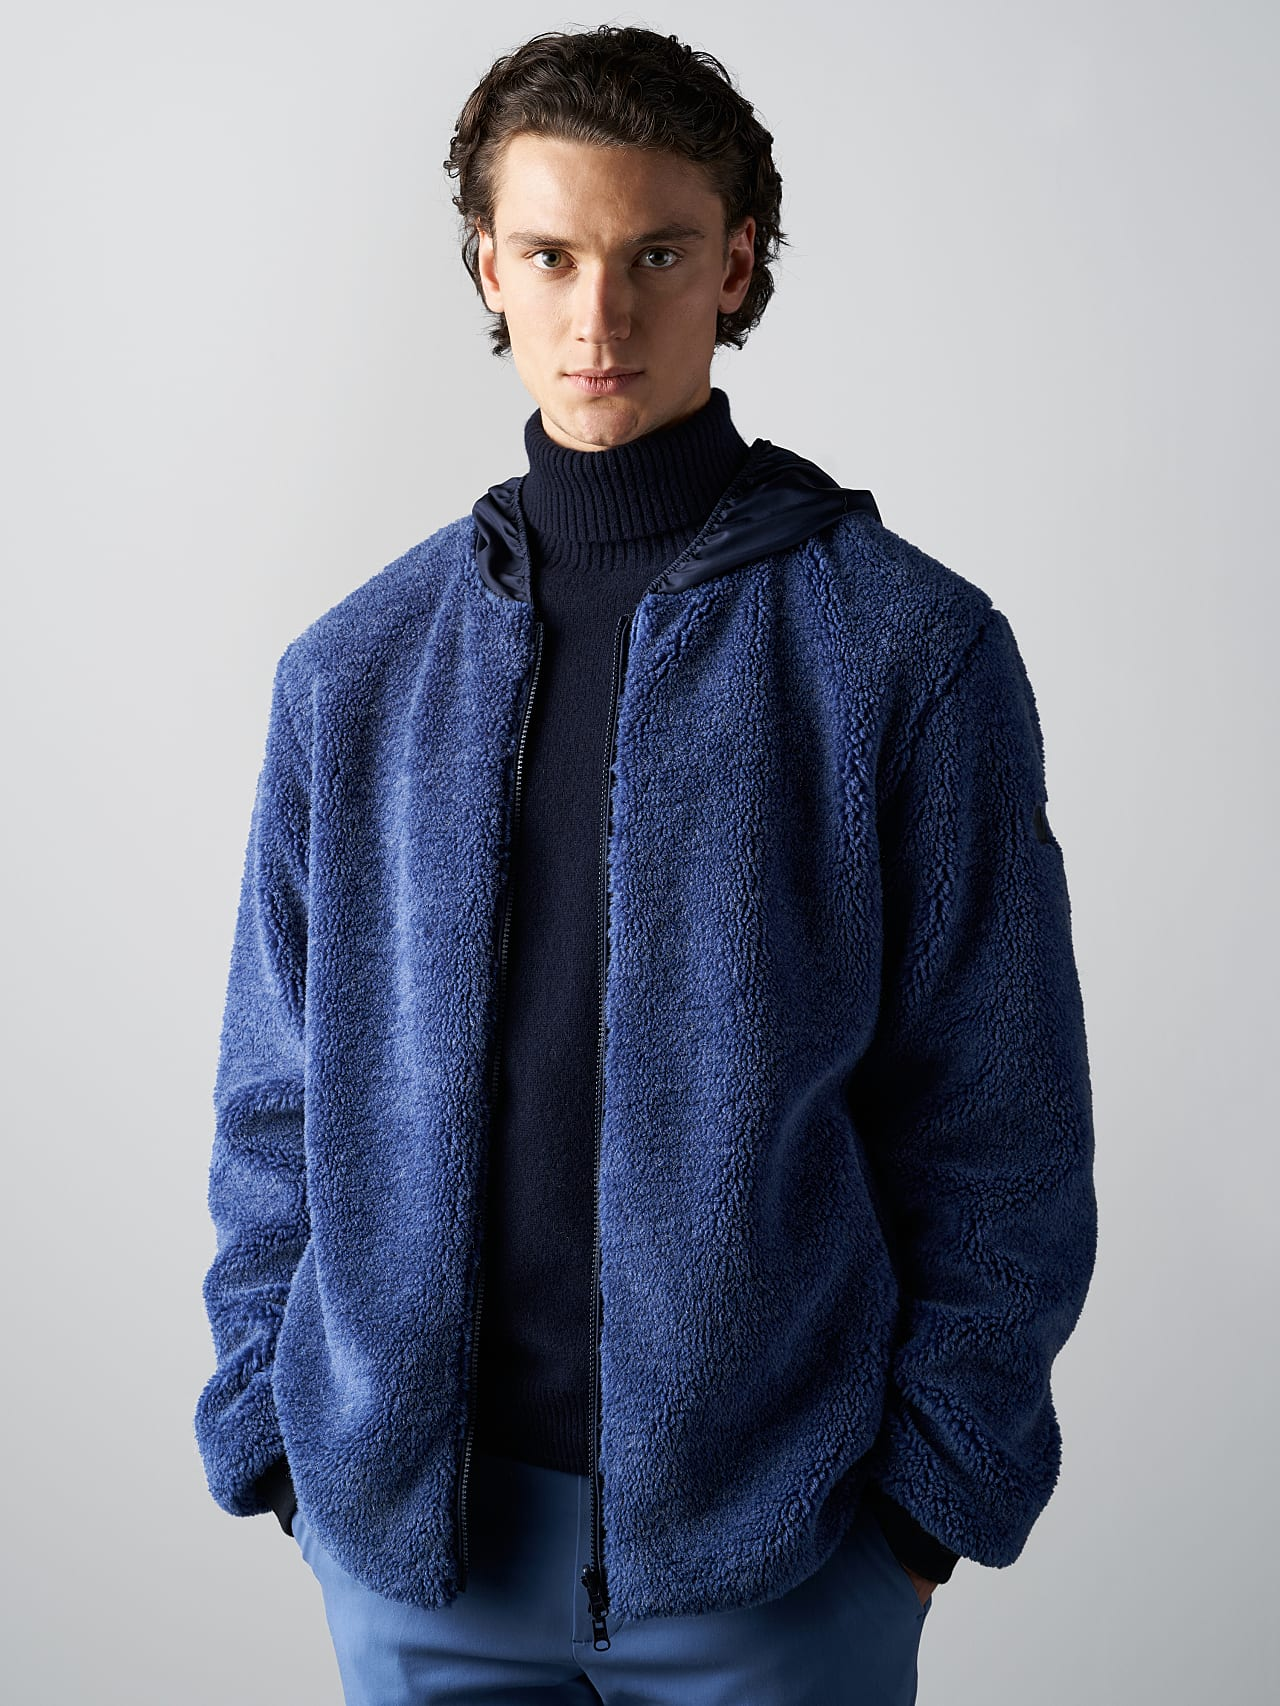 OVEDY V1.Y5.02 Reversible Wool-Blend Teddy Jacket light blue Model shot Alpha Tauri